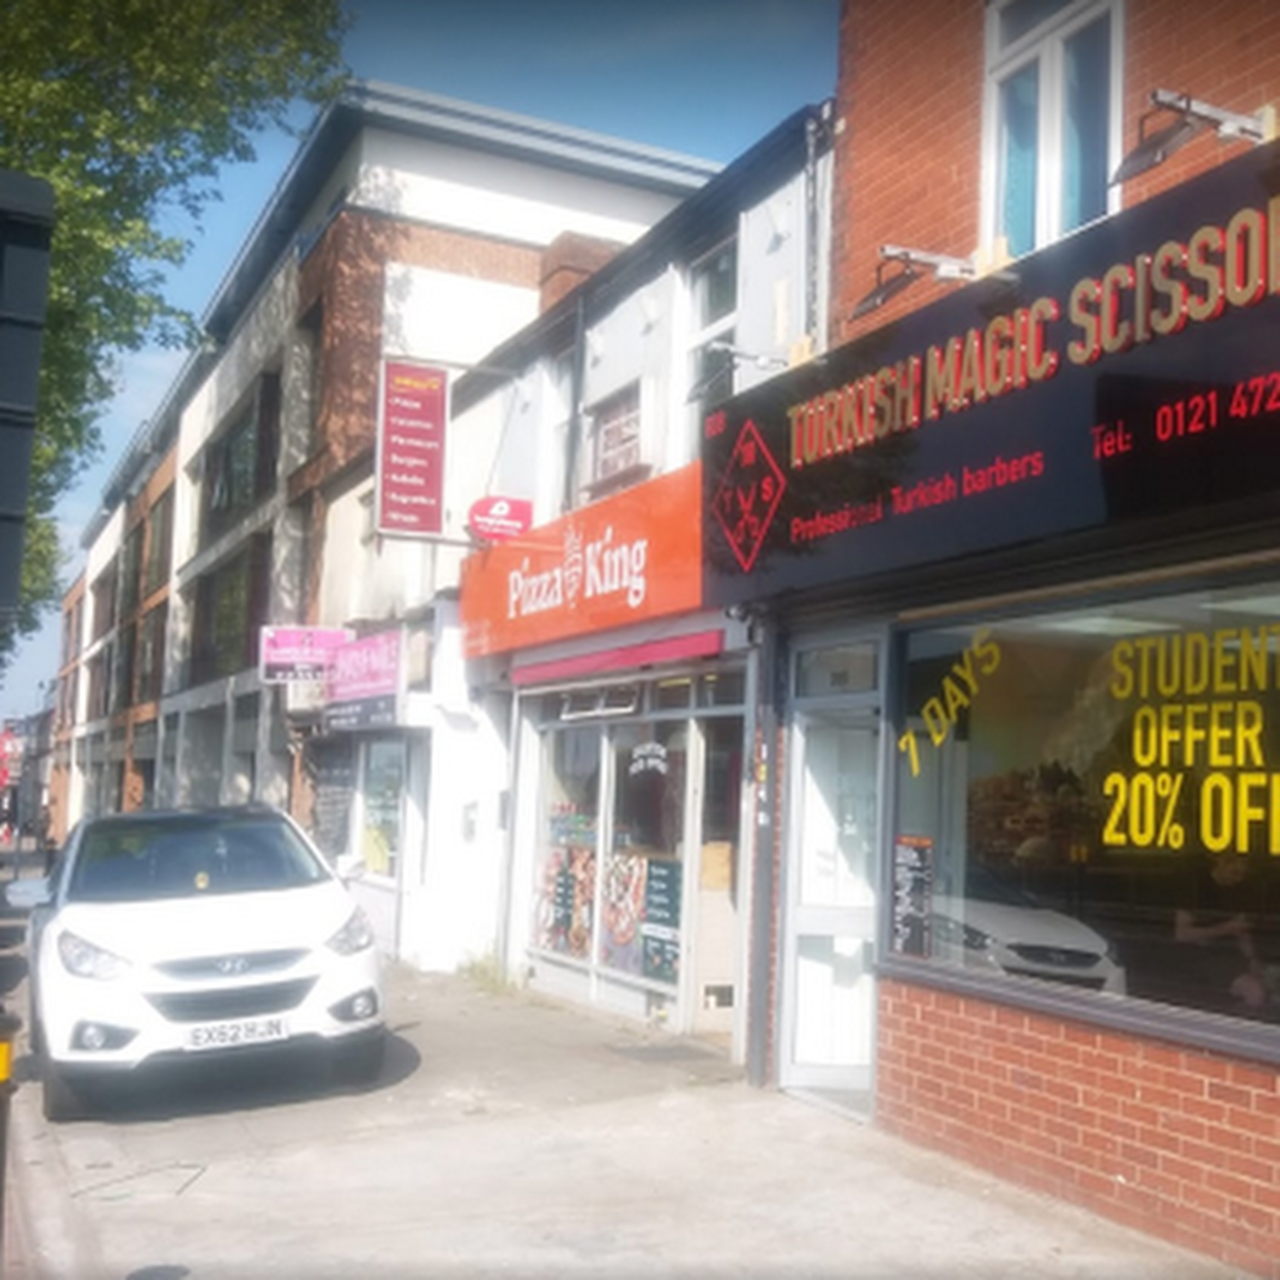 Turkish Magic Scissors   Barber Shop